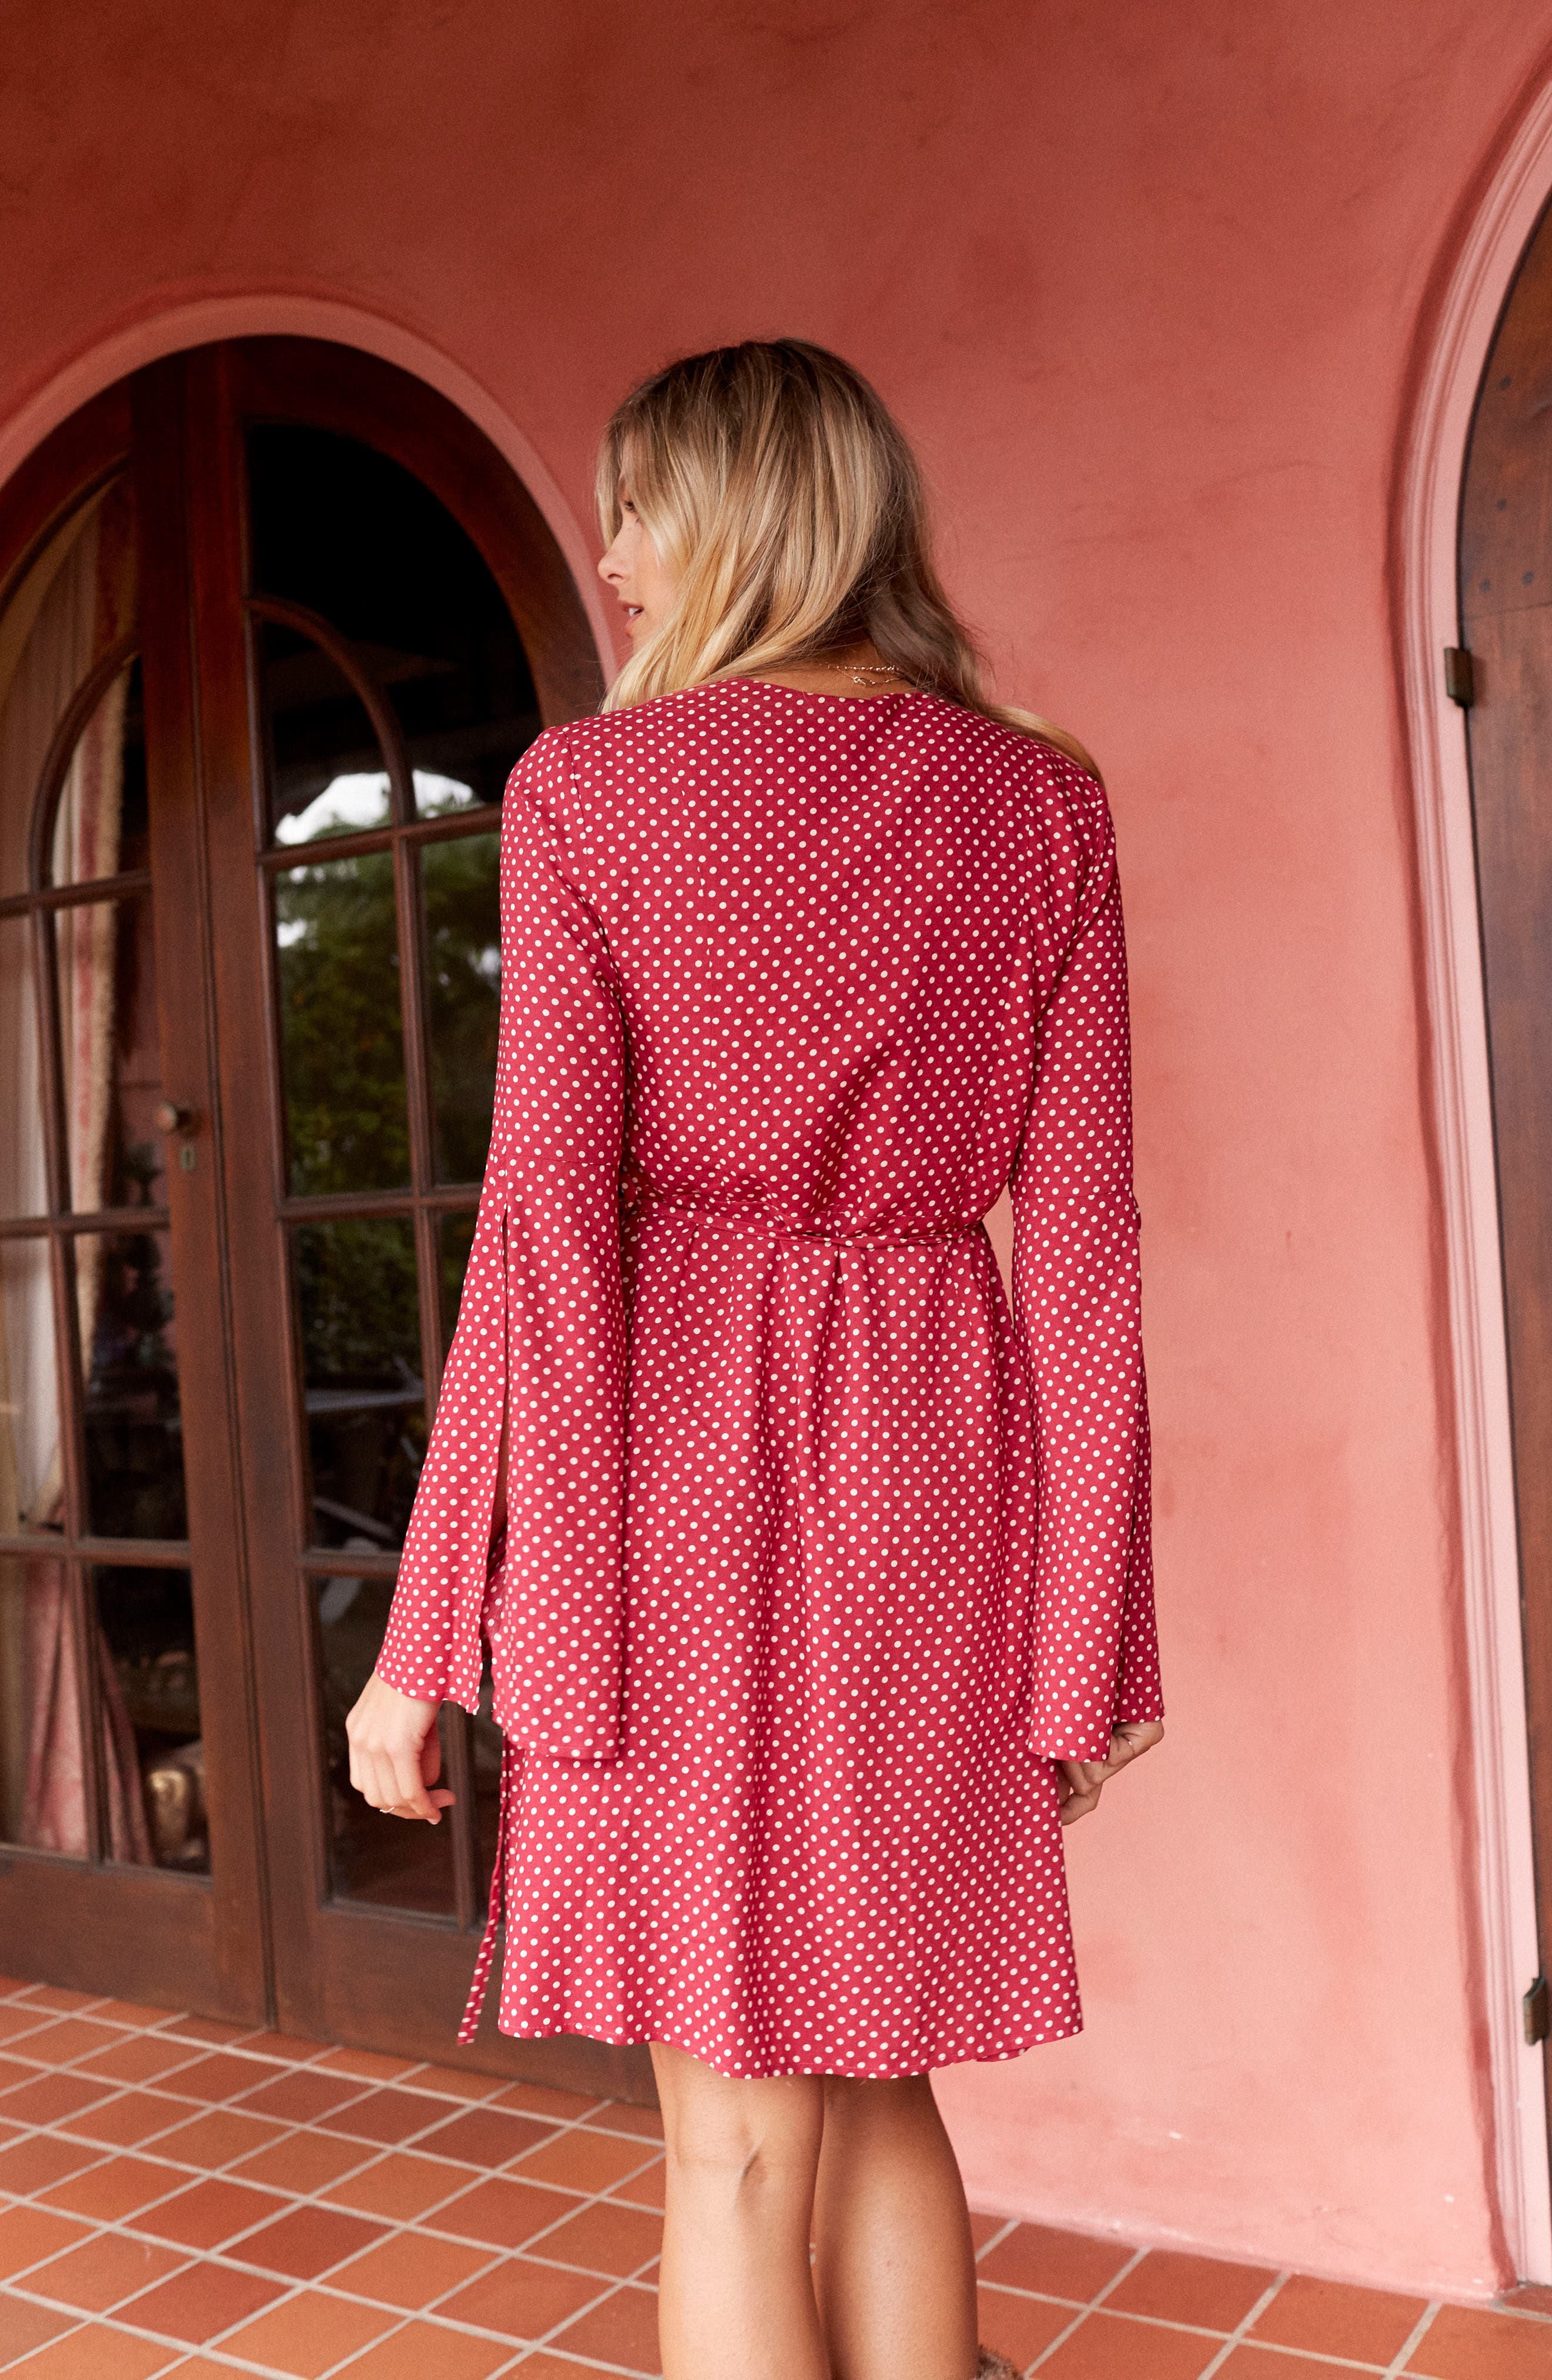 Fearless Polka Dot Wrap Dress,                             Alternate thumbnail 8, color,                             Multi Red